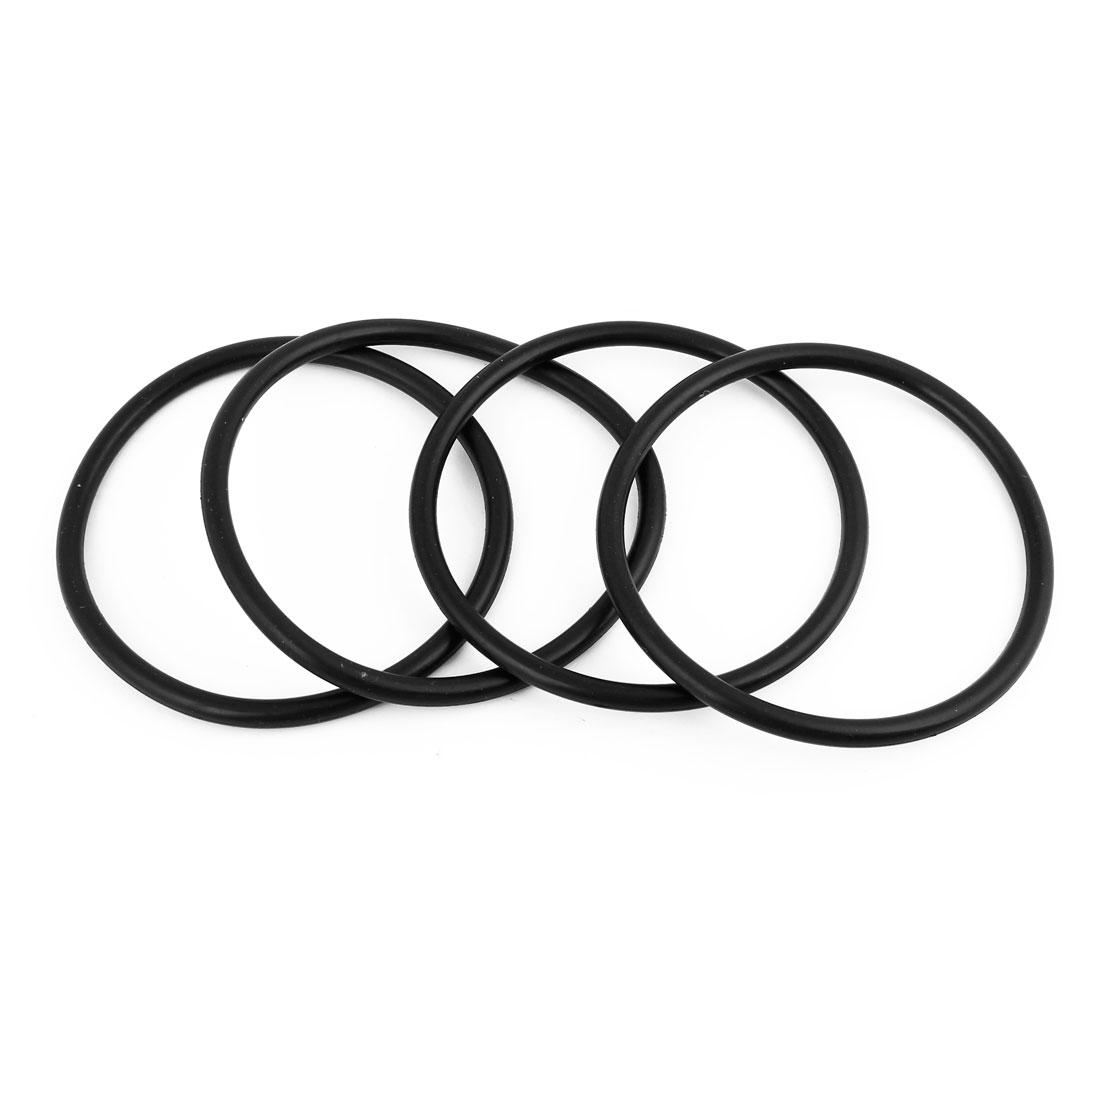 4 Pcs Black HNBR Car Van Air Con A/C Seal O Ring 85 x 5mm